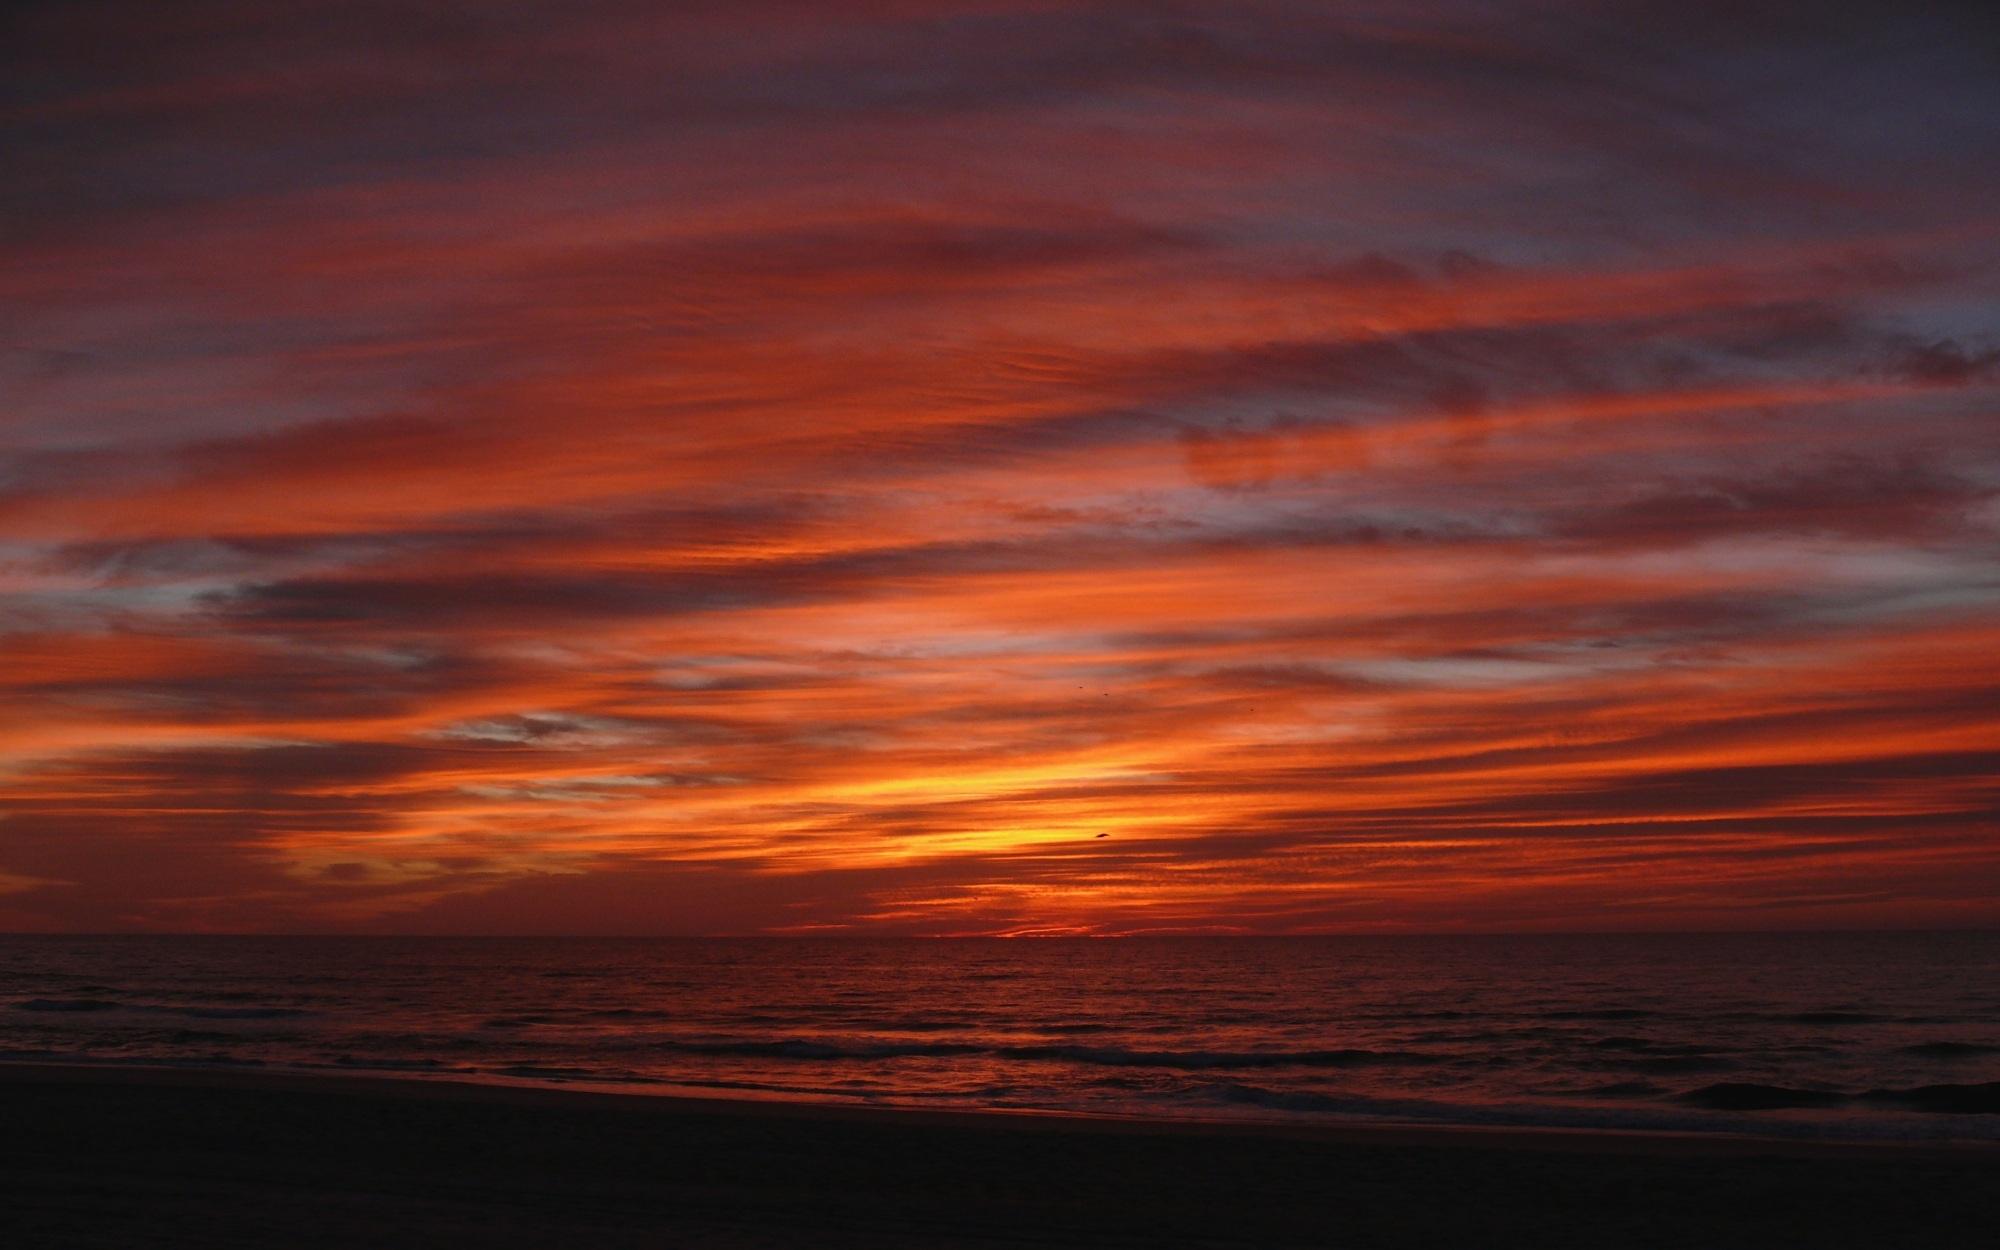 Sunrise on the ocean photo